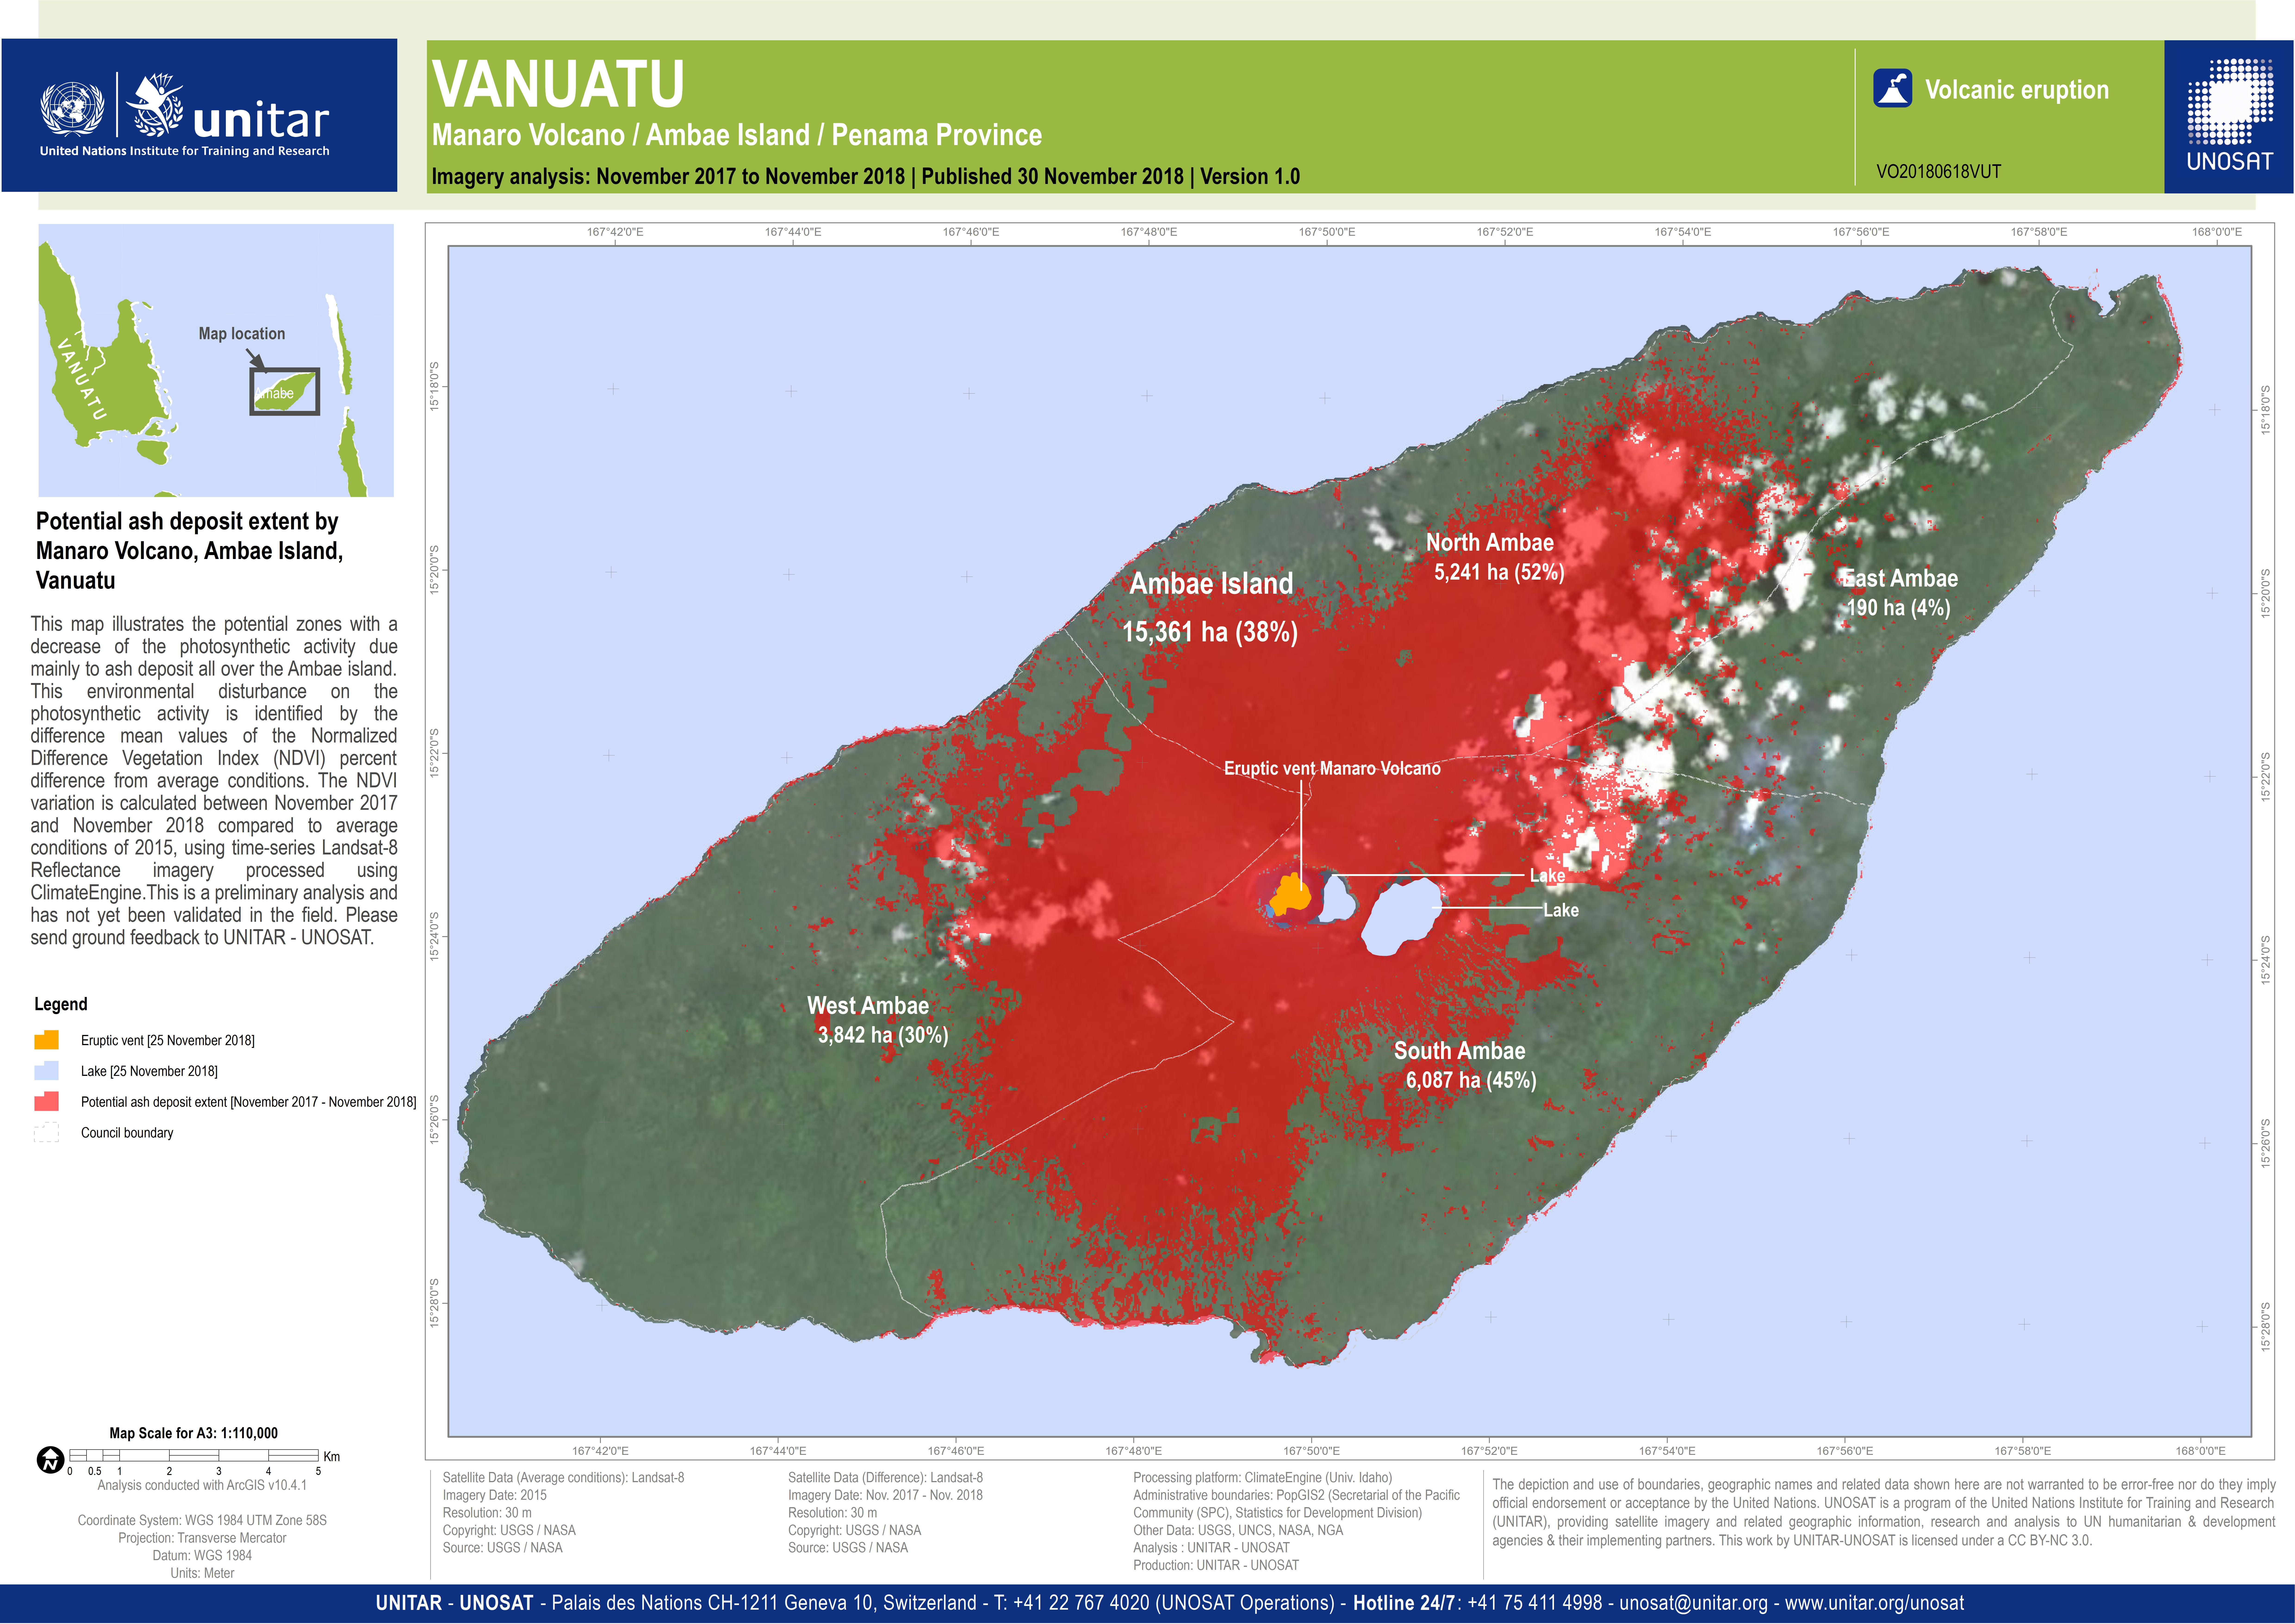 map of idaho hot springs, map of idaho geology, map of idaho politics, map of idaho food, map of idaho streams, map of idaho fires, map of idaho wildlife, map of idaho legislative districts, map of idaho with mountains, map of idaho rivers, map of idaho geography, map of idaho landforms, map of idaho lakes, map of idaho water, map of idaho agriculture, map of idaho national parks, map of idaho fault lines, map of idaho desert, map of idaho dunes, on idaho map of volcanoes